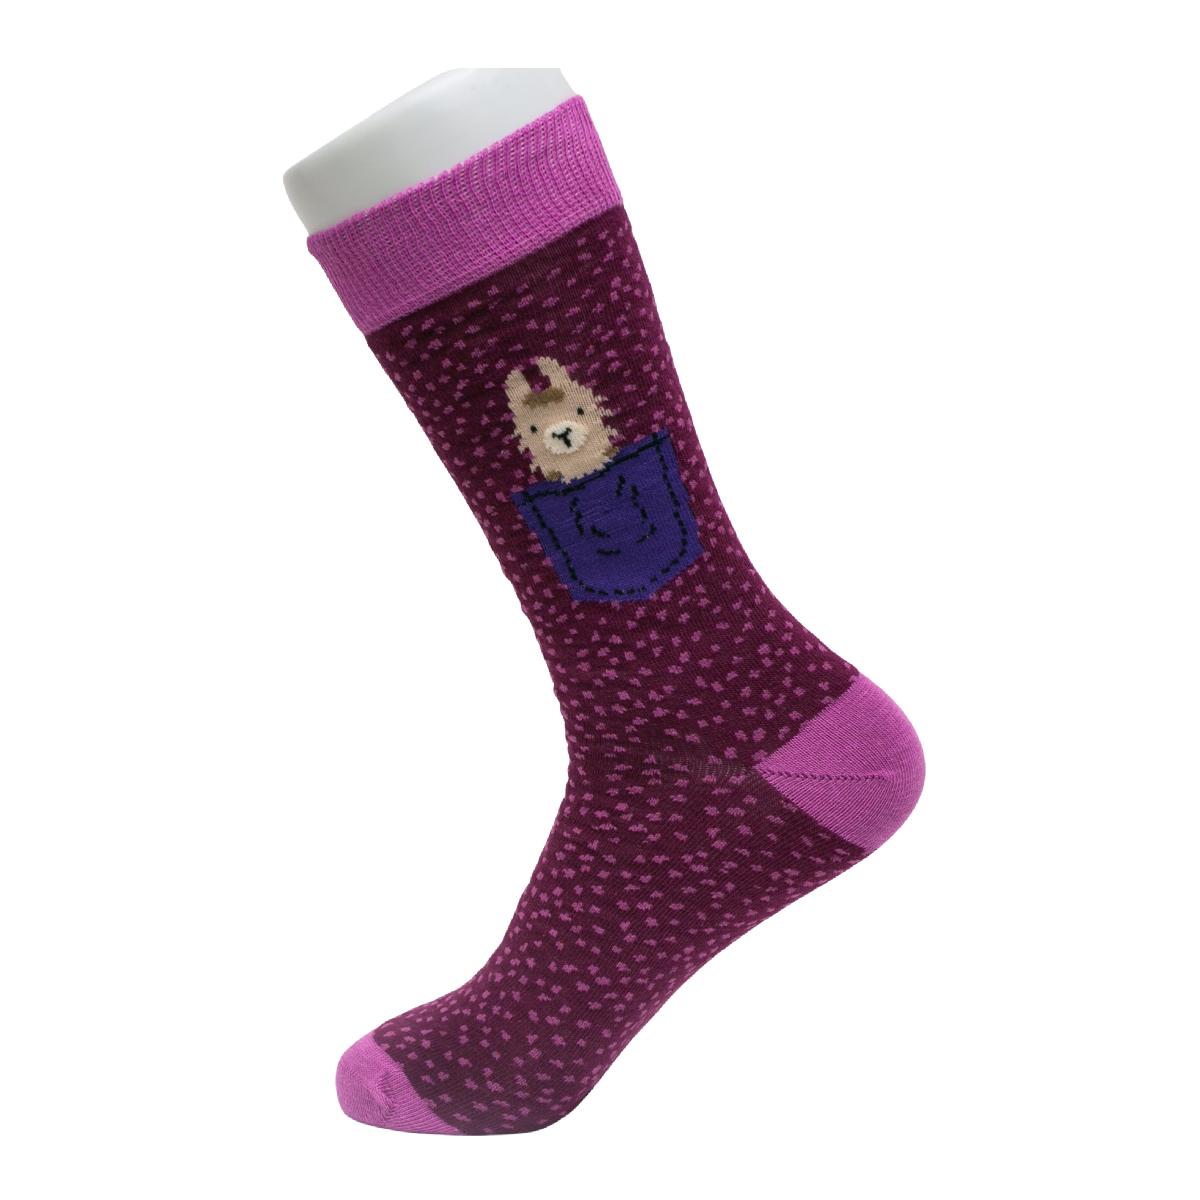 Socks Atomica Socks Atomica Llama Pocket